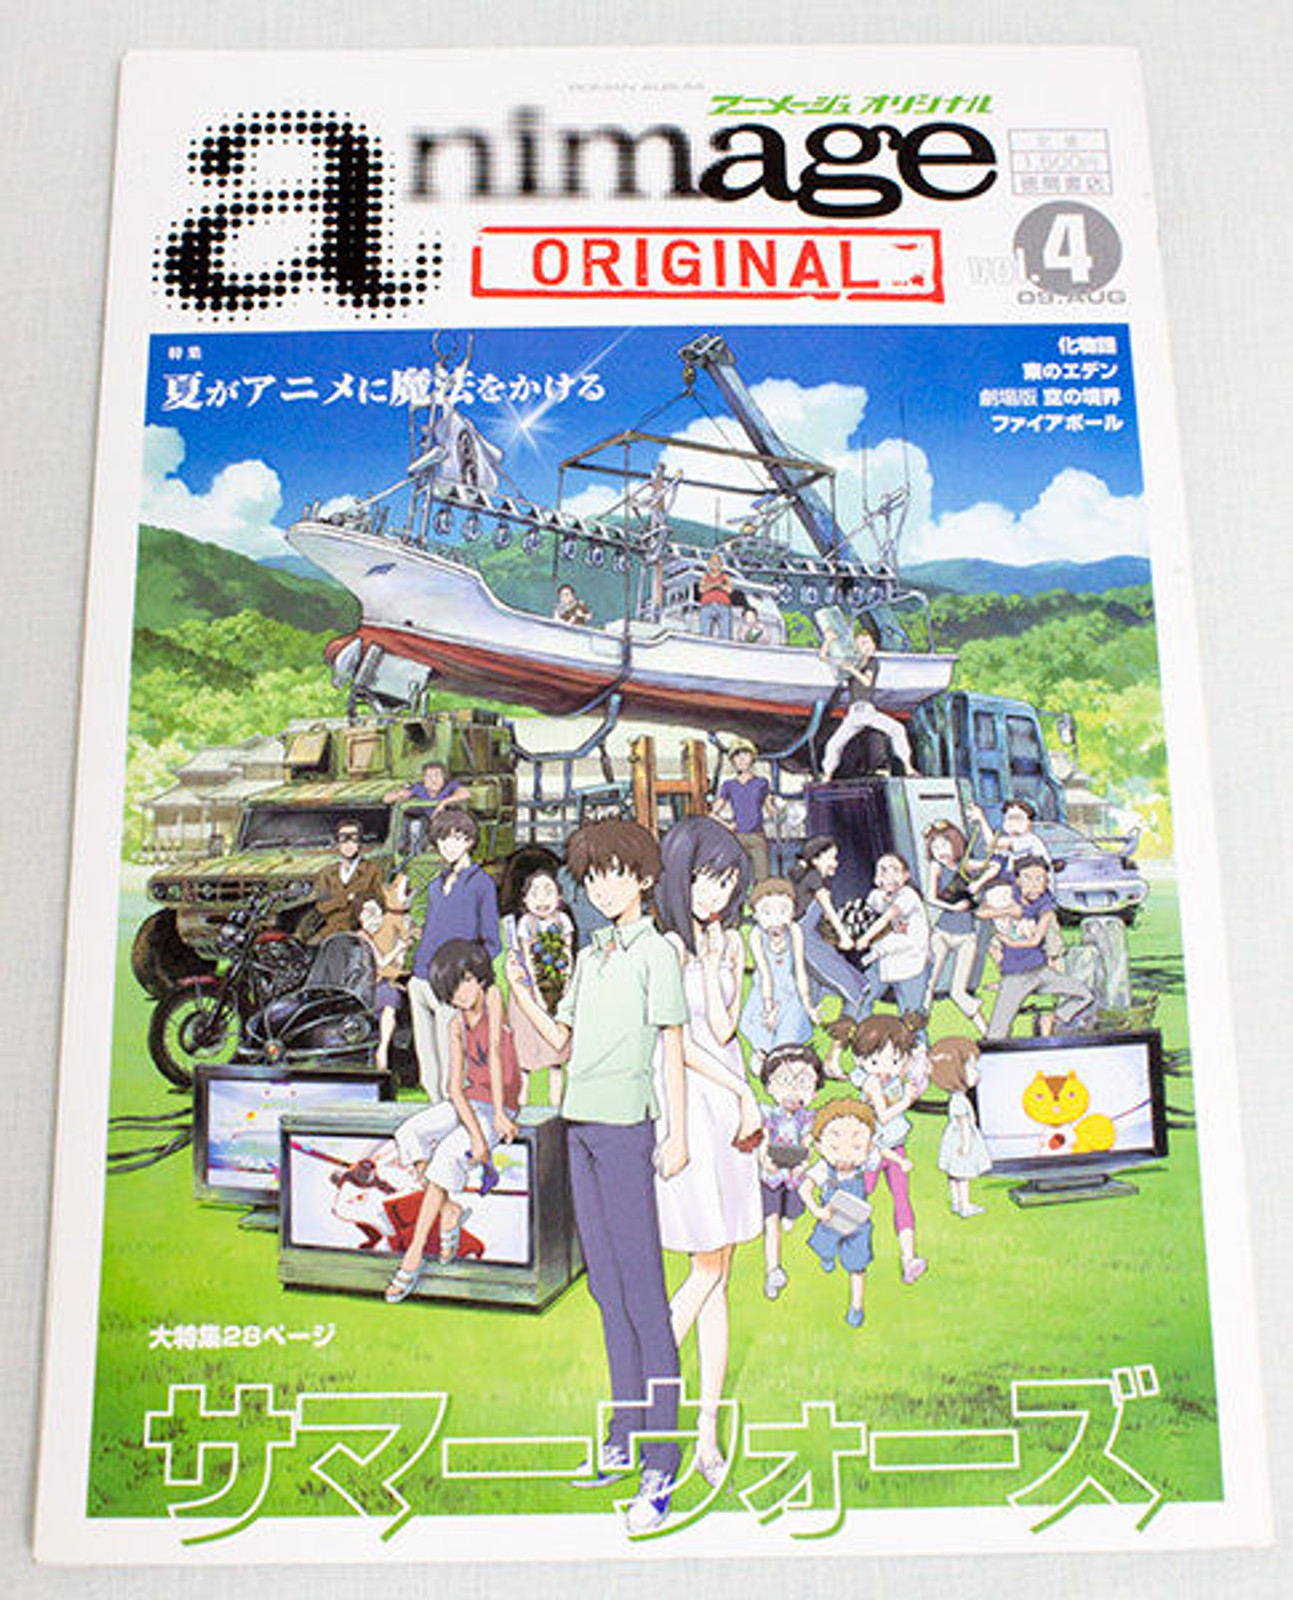 Animage Original Japan Anime Magazine 08/2009 Vol.4 SUMMER WARS/BAKEMONOGATARI